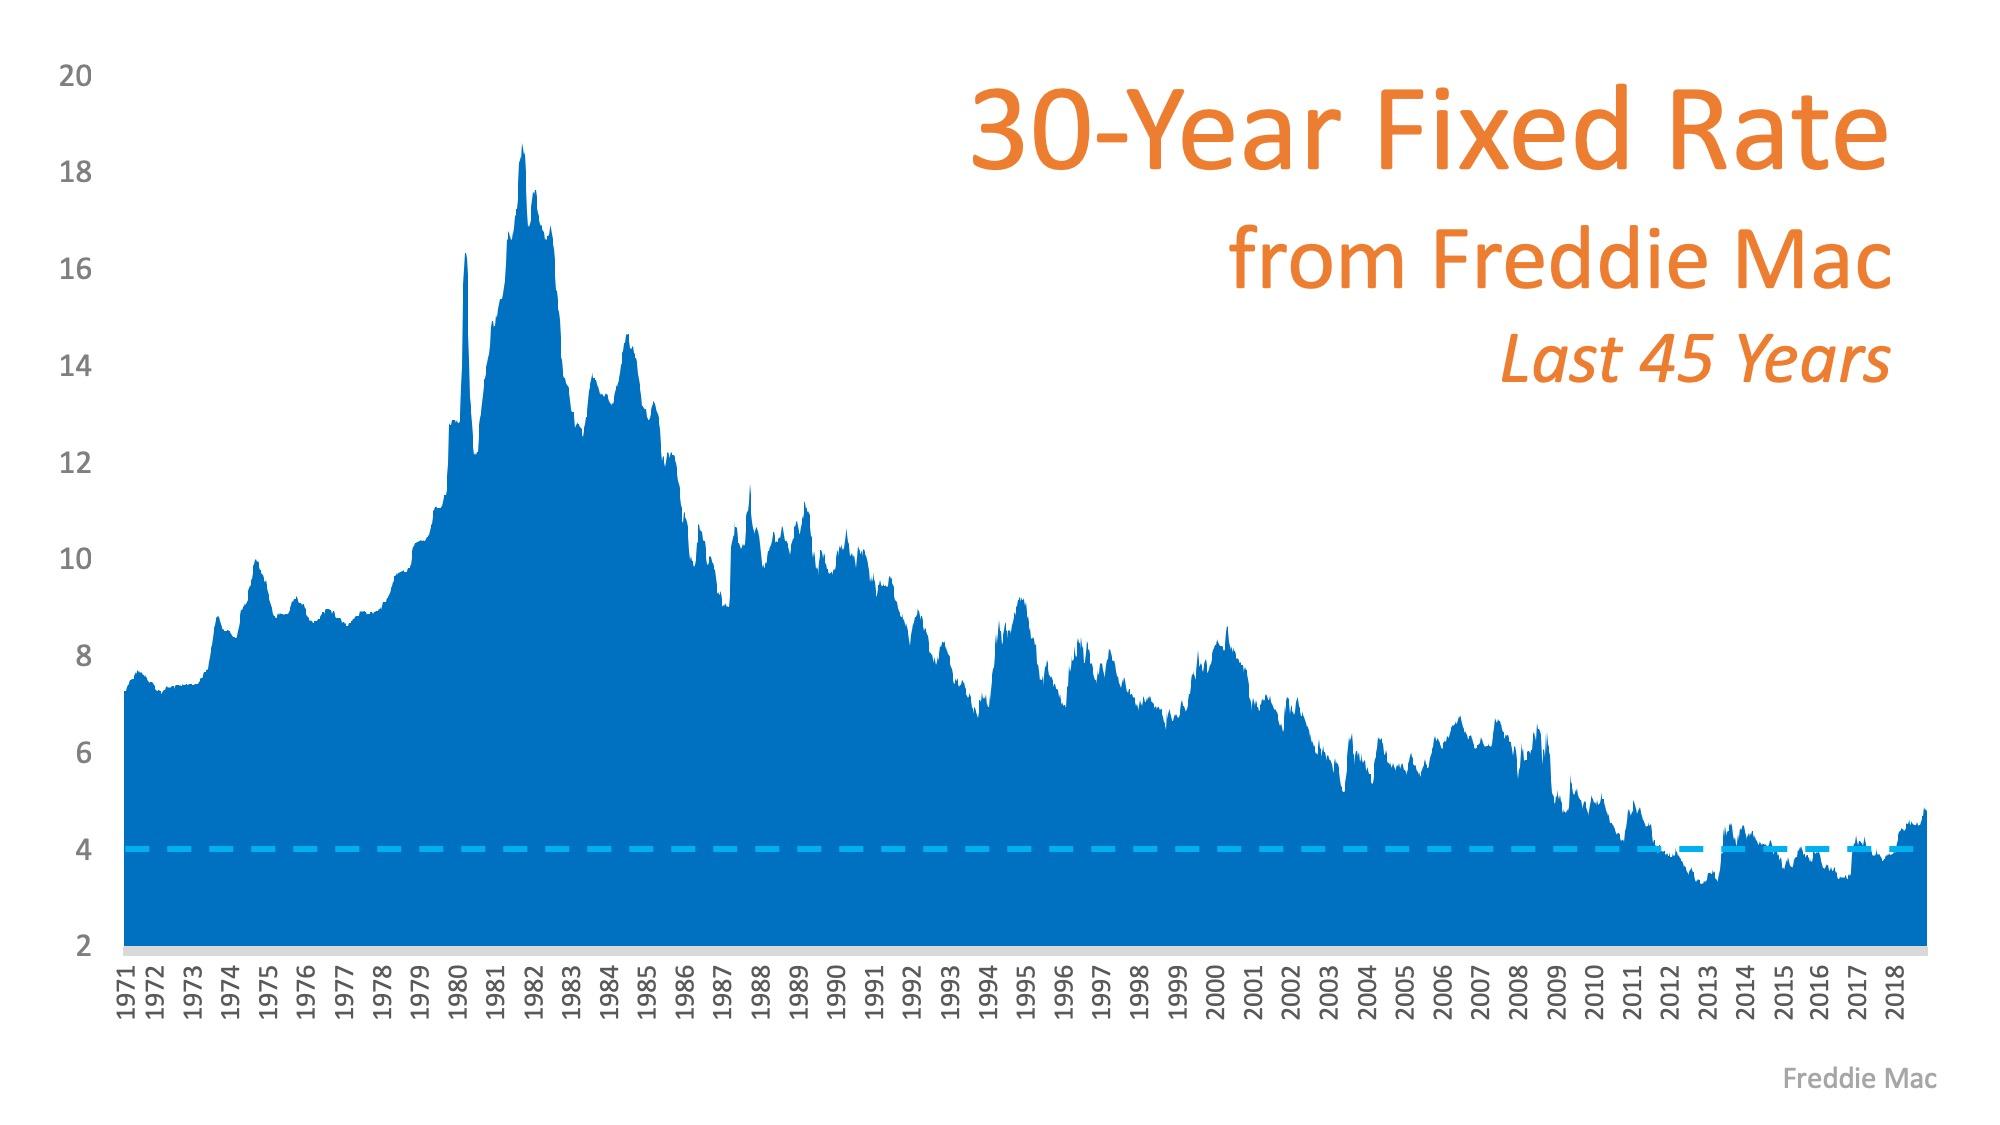 2019 Interest Rate Historical Comparison